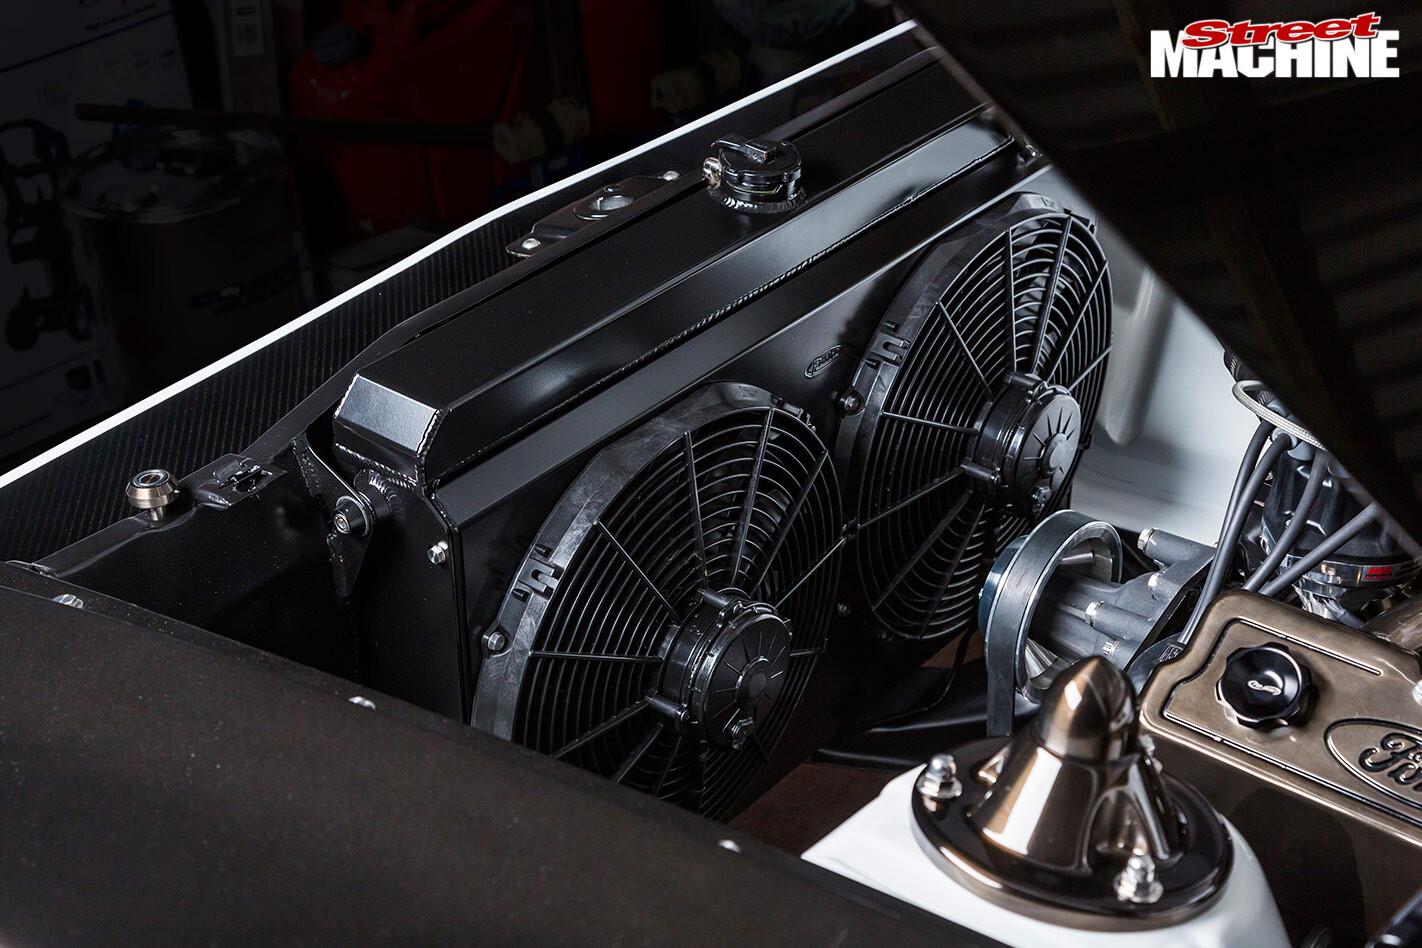 Ford Falcon XB radiator fans